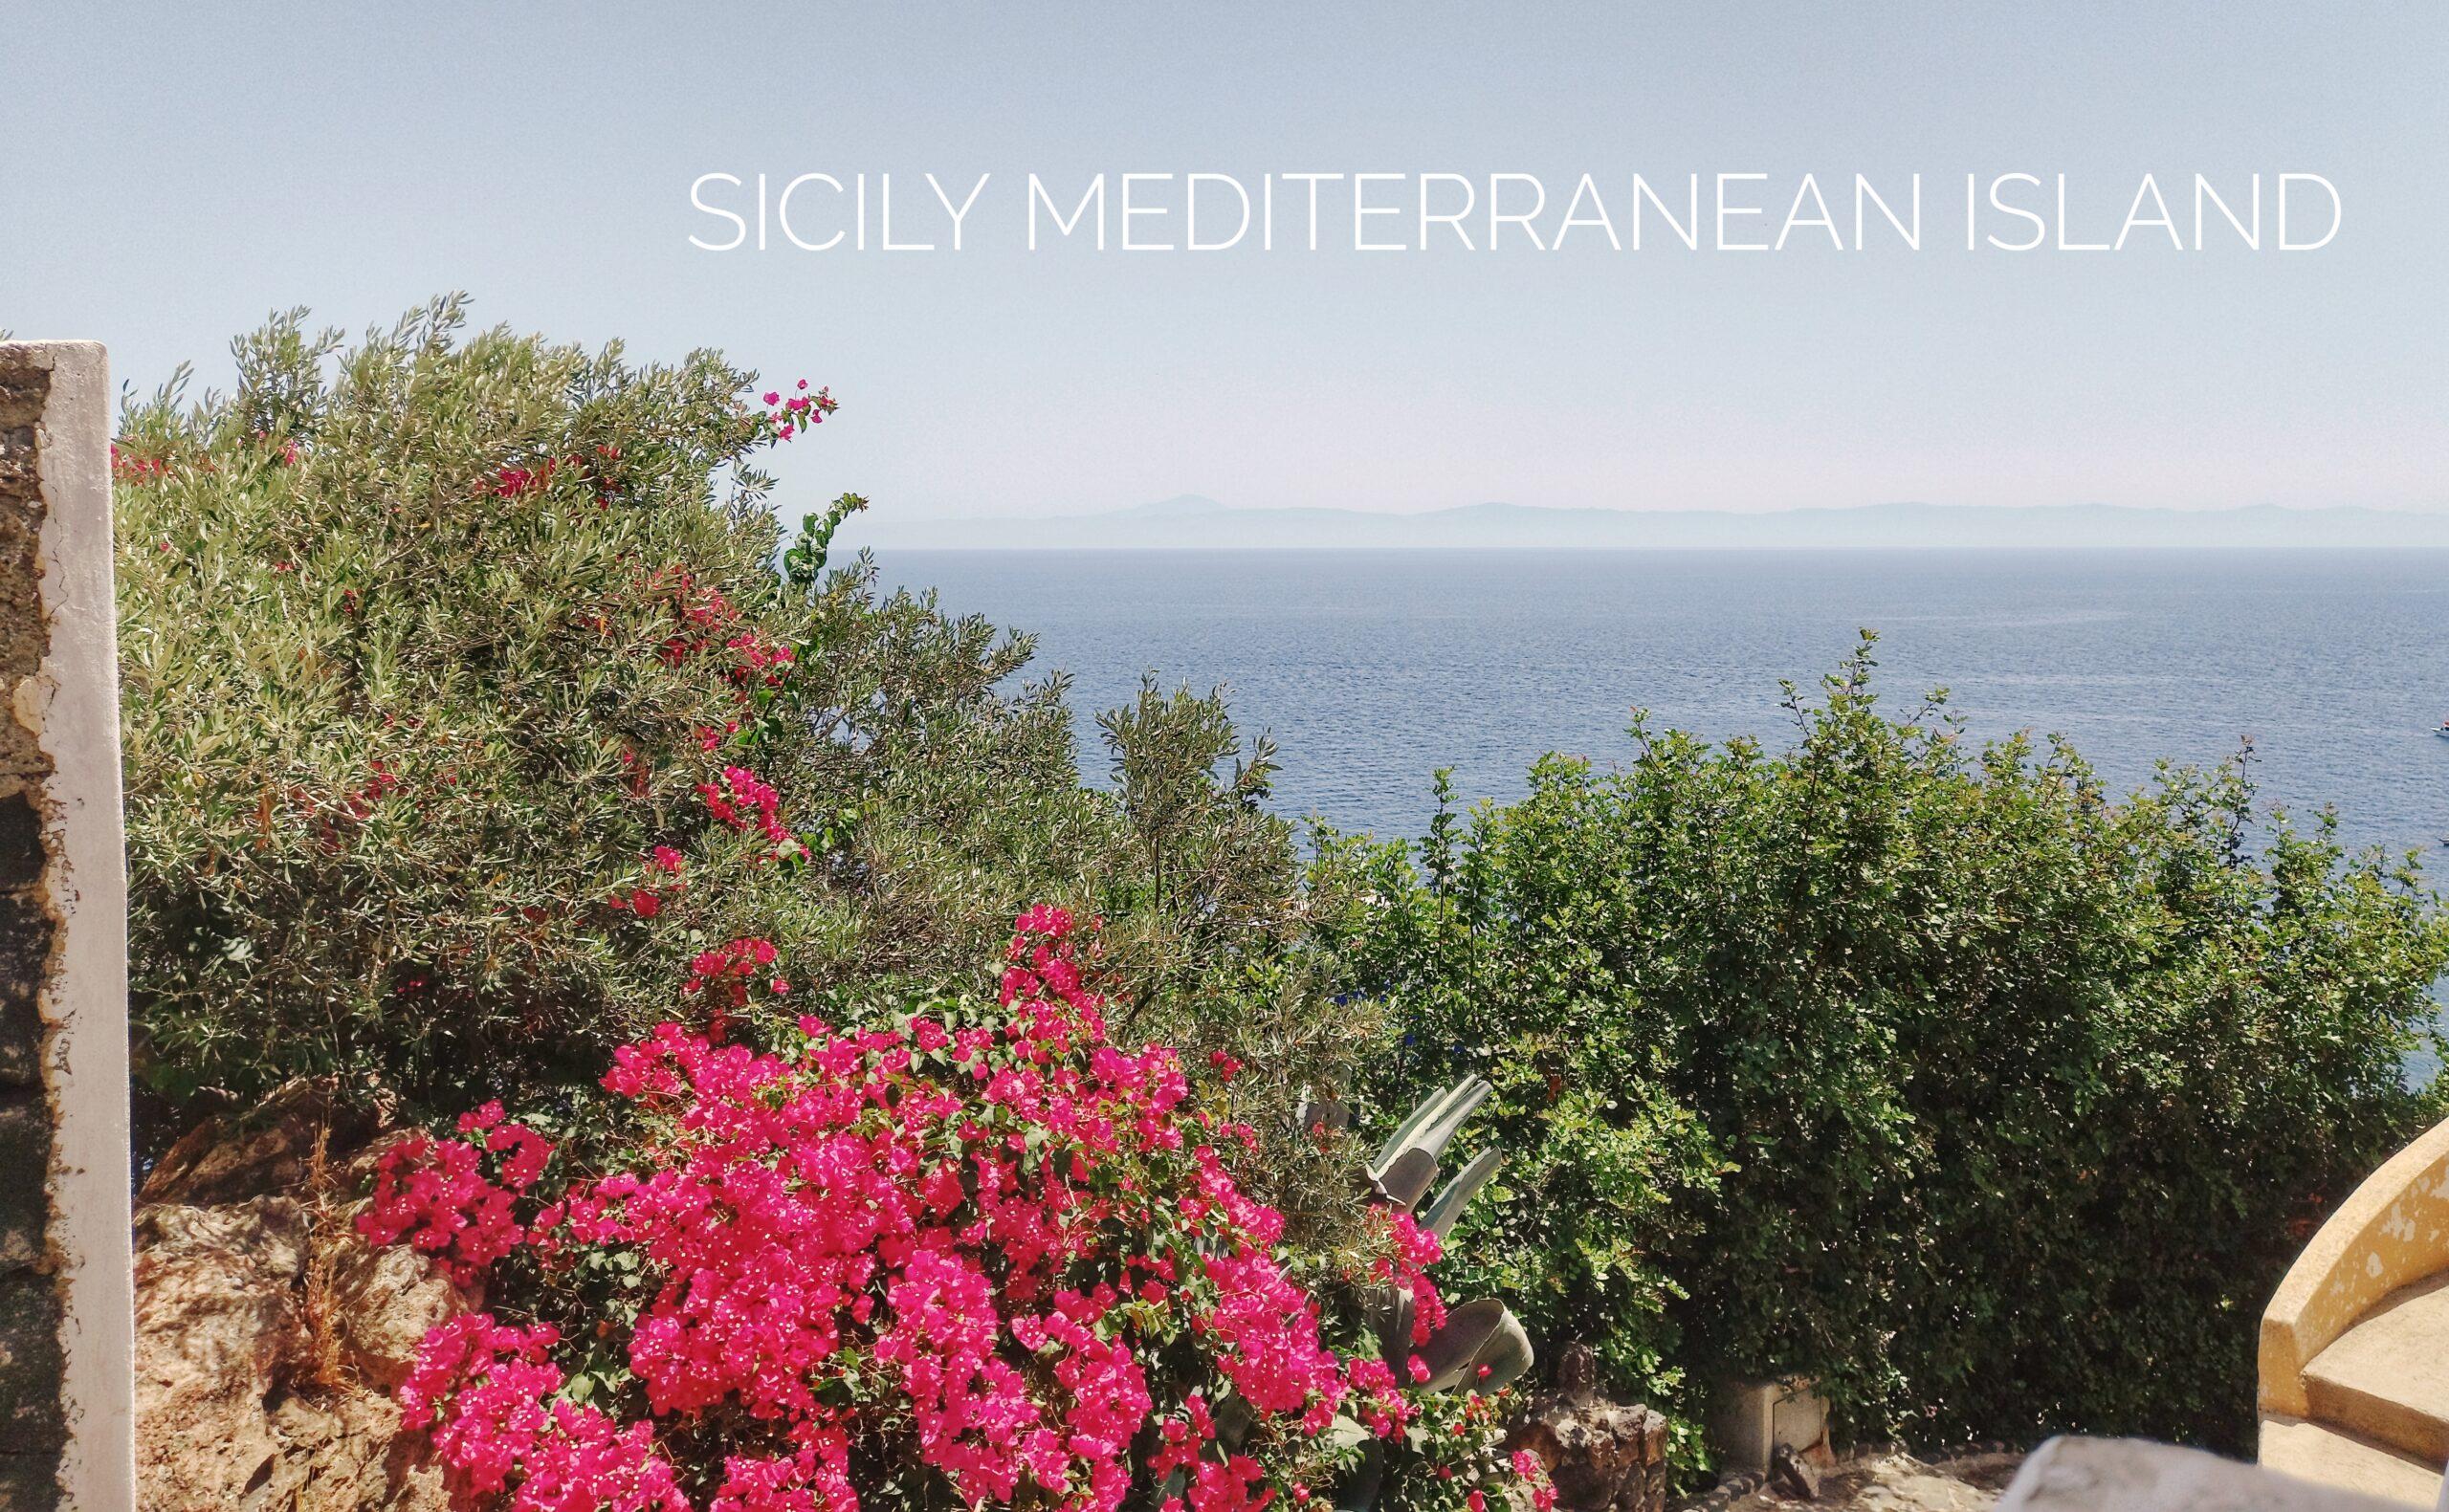 Sicilia Isola del Mediterraneo